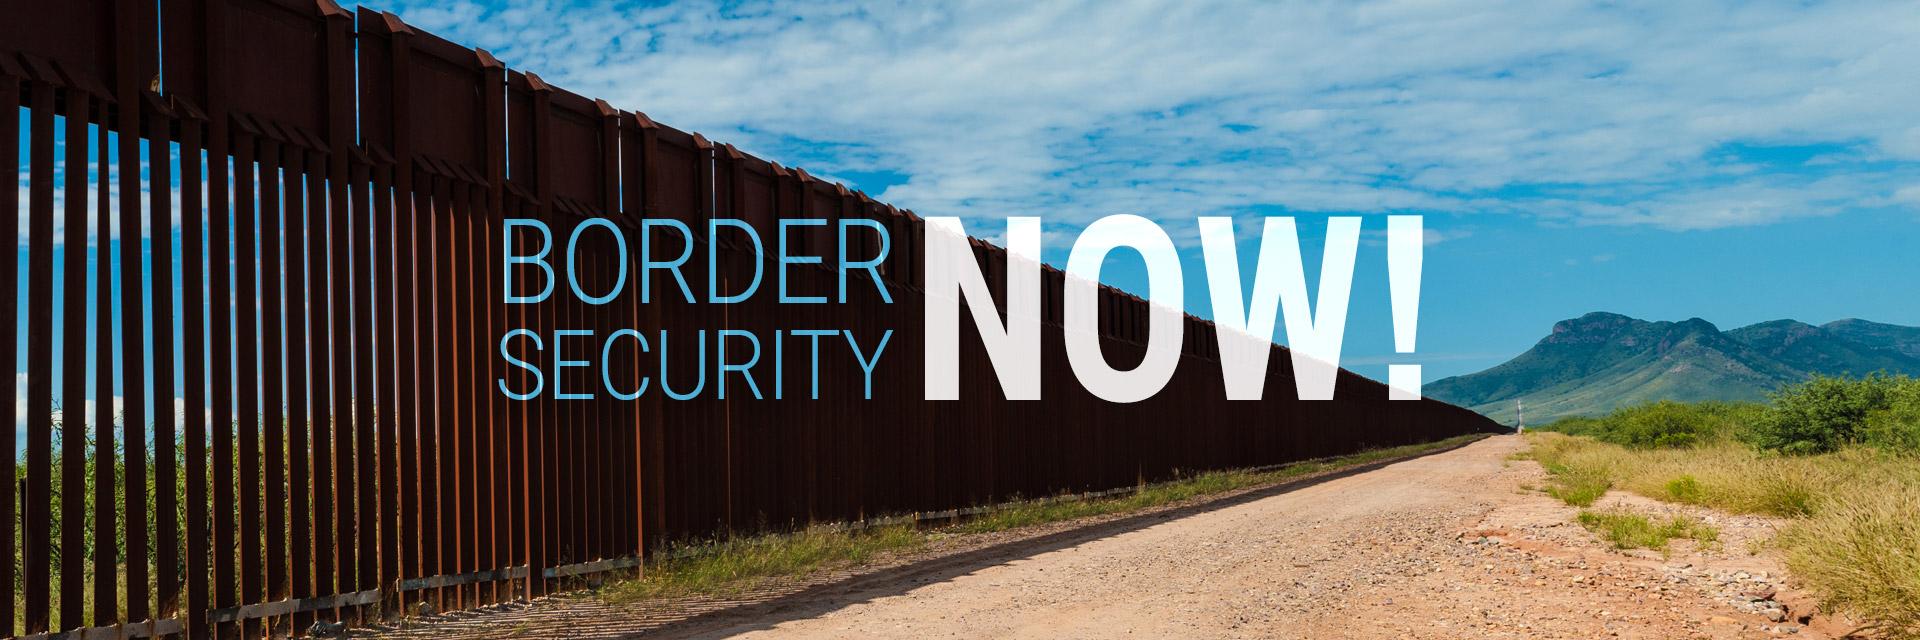 Border-Security-Now-Slider3